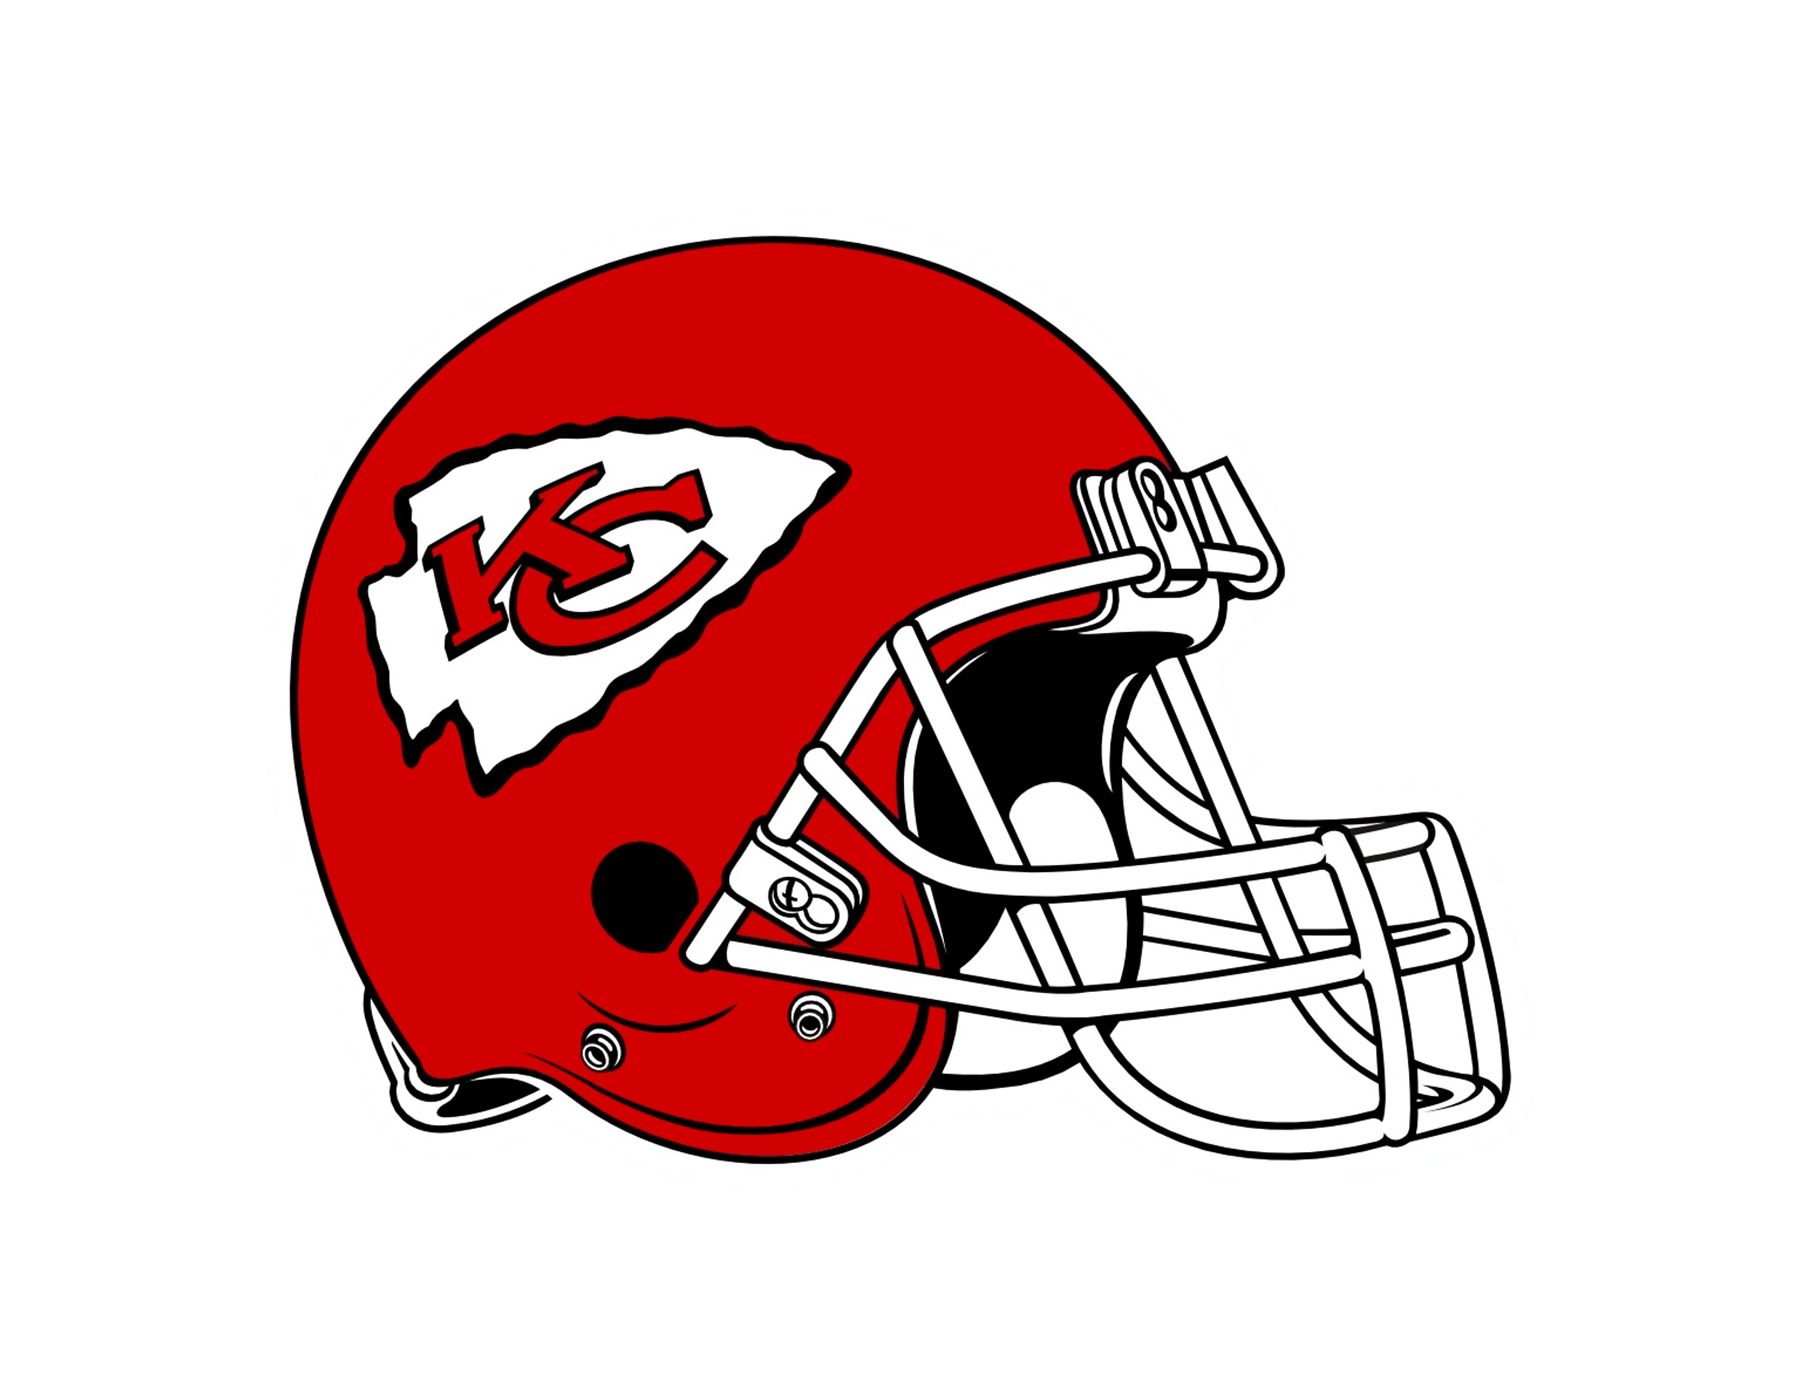 Kansas City Chiefs Helmet Logo - Kansas City Chiefs, Transparent background PNG HD thumbnail